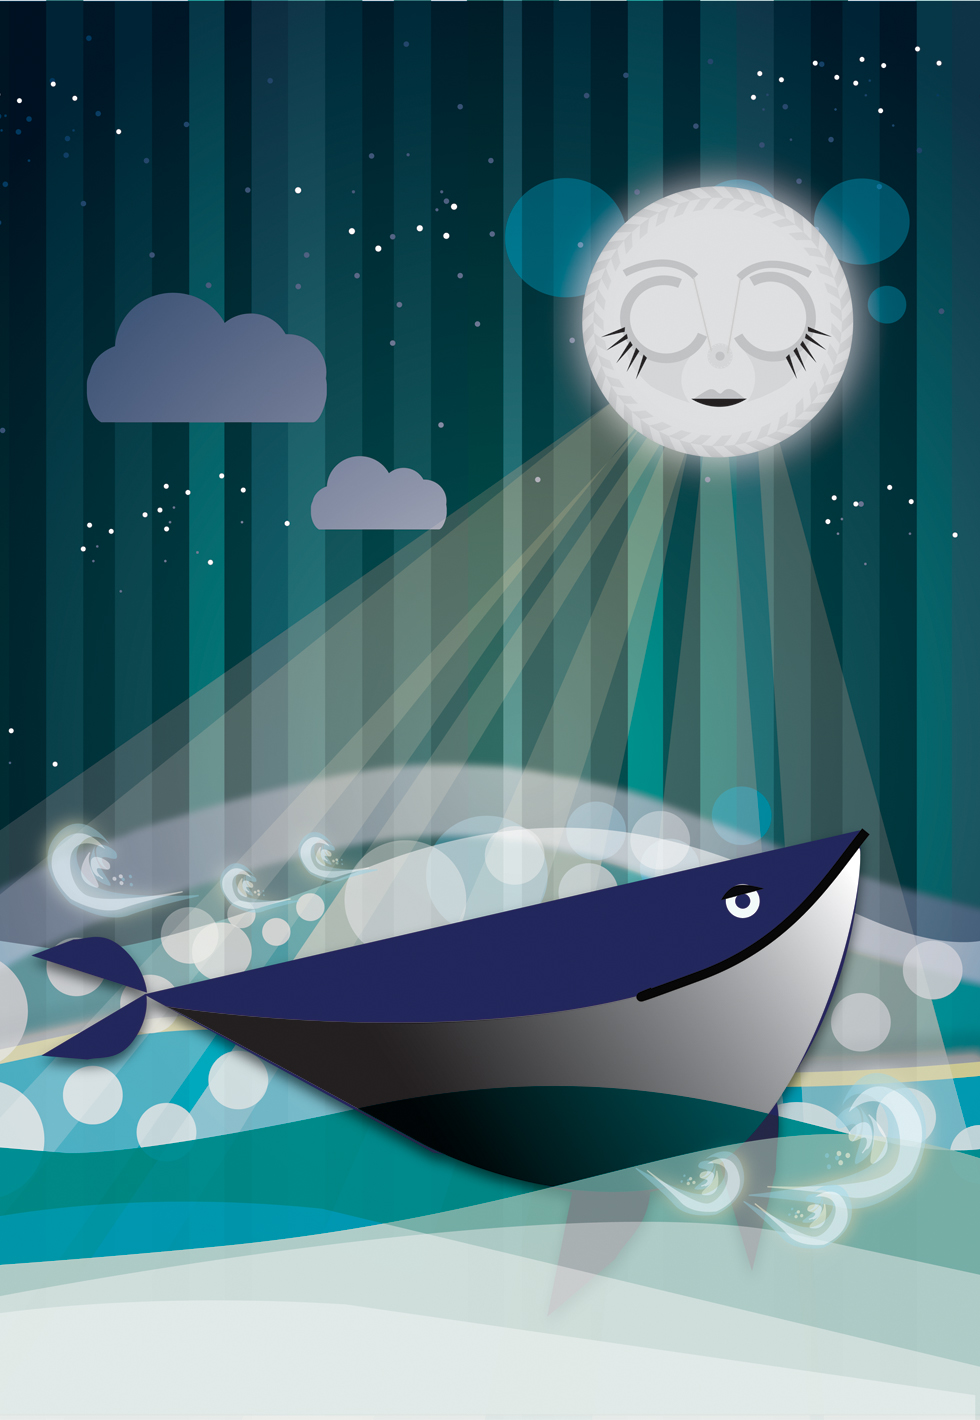 ocean scene Completed Computer Arts tutorial in Adobe Illustrator 980x1420